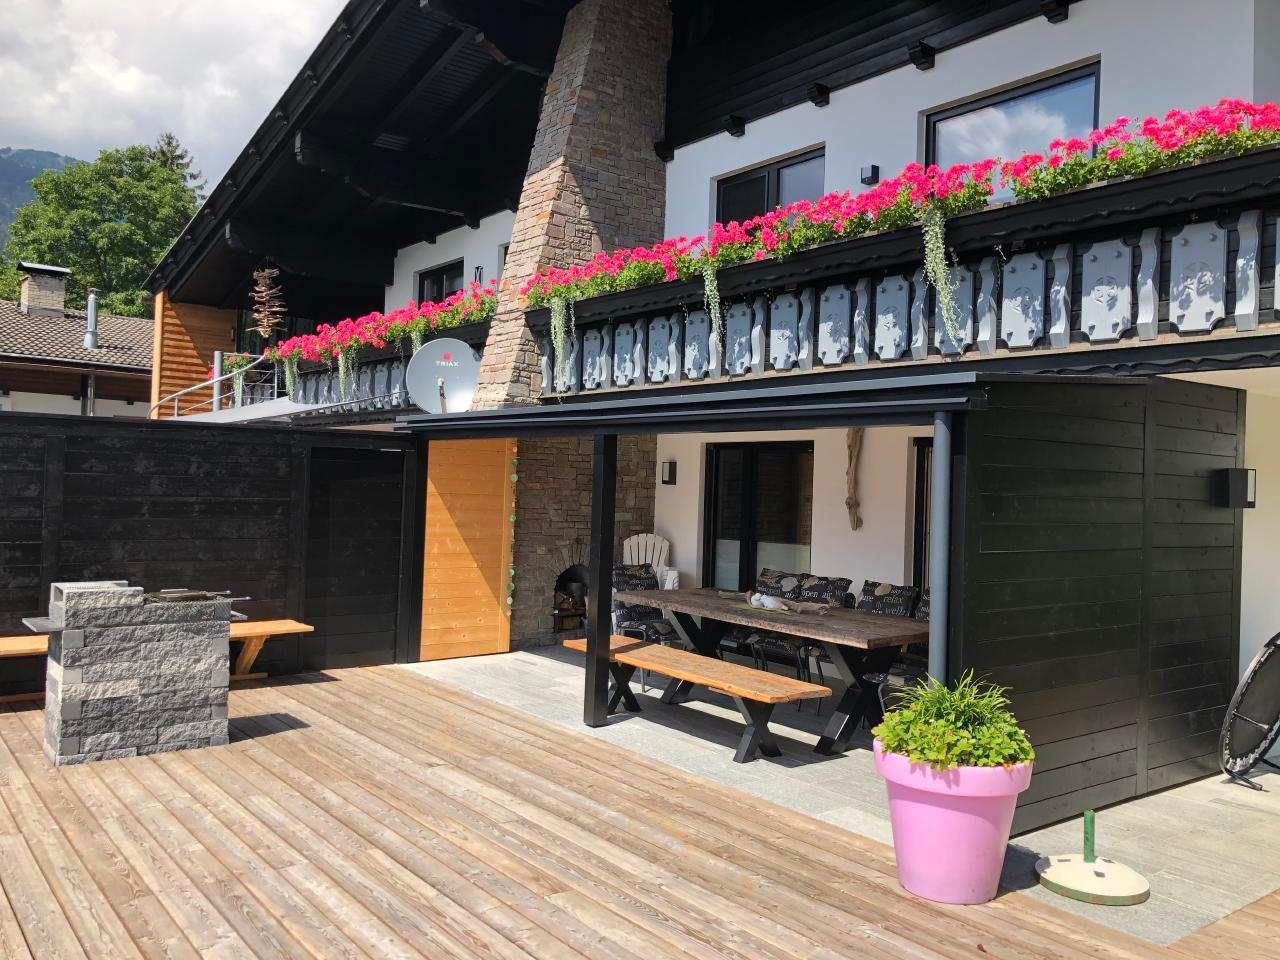 Maison de vacances Landhaus Osttirol (2299545), Dölsach, Osttirol, Tyrol, Autriche, image 36